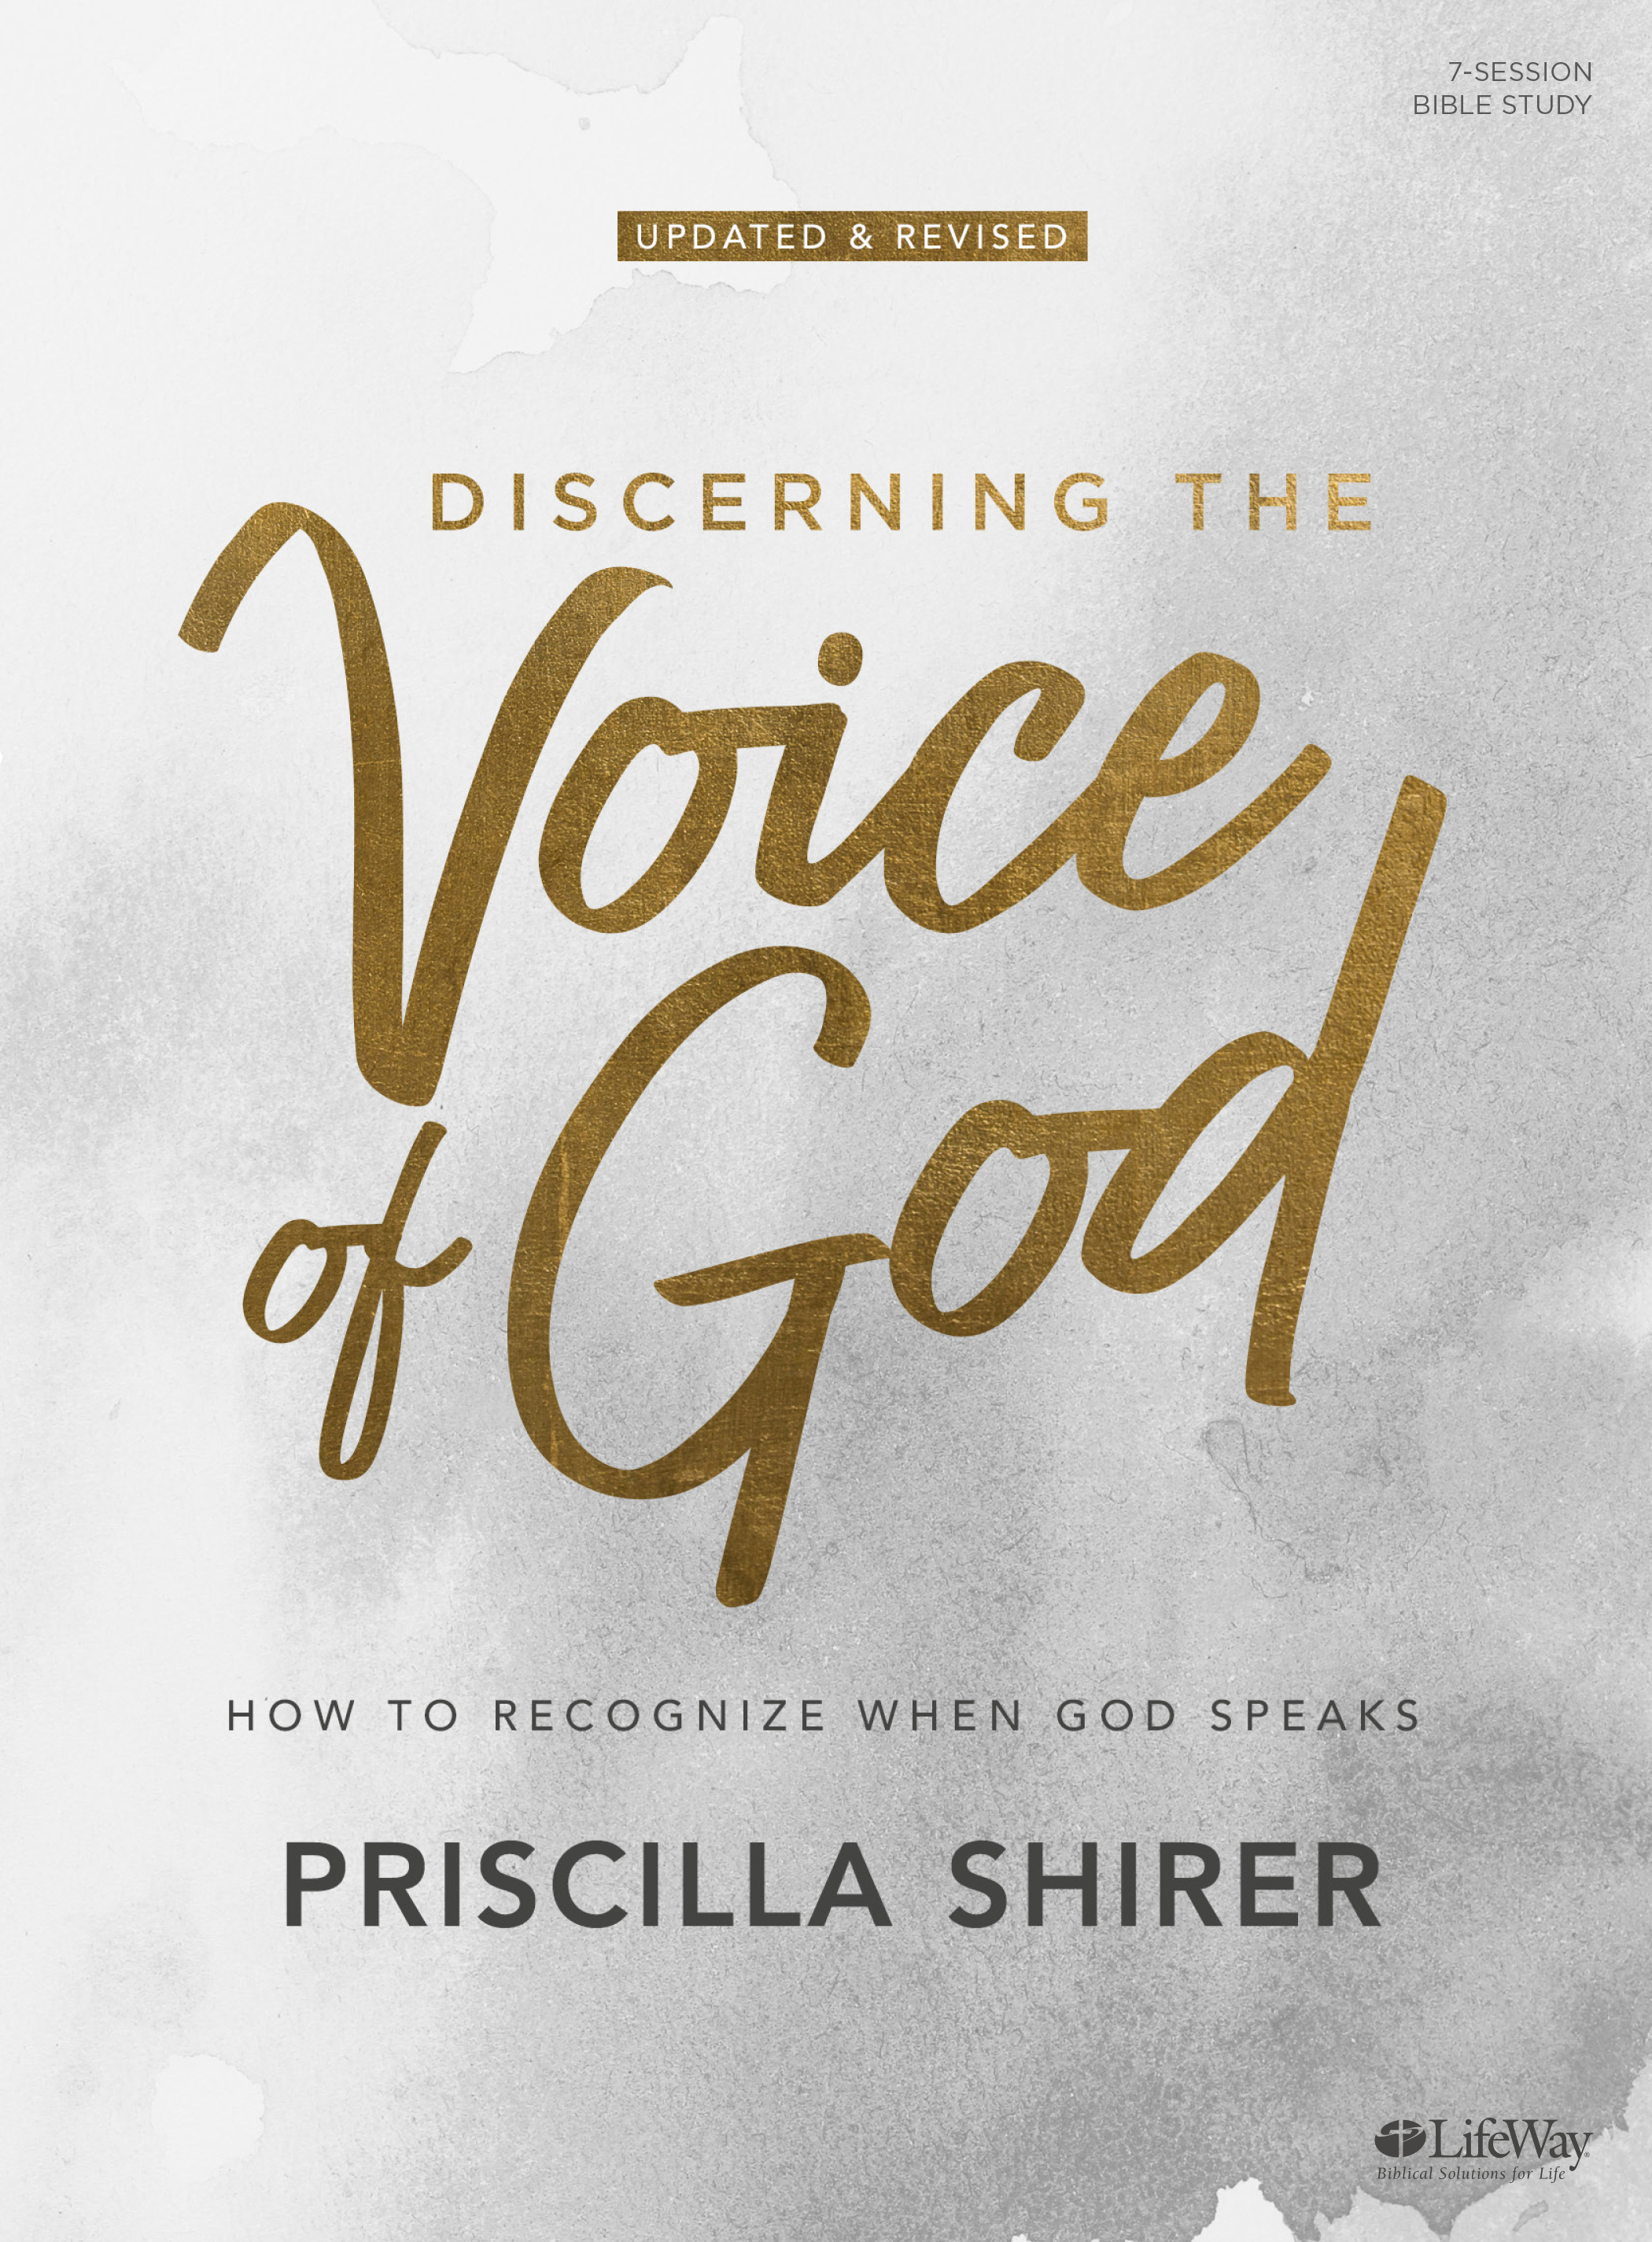 Discerning The Voice Of God Workbook Revised Ed